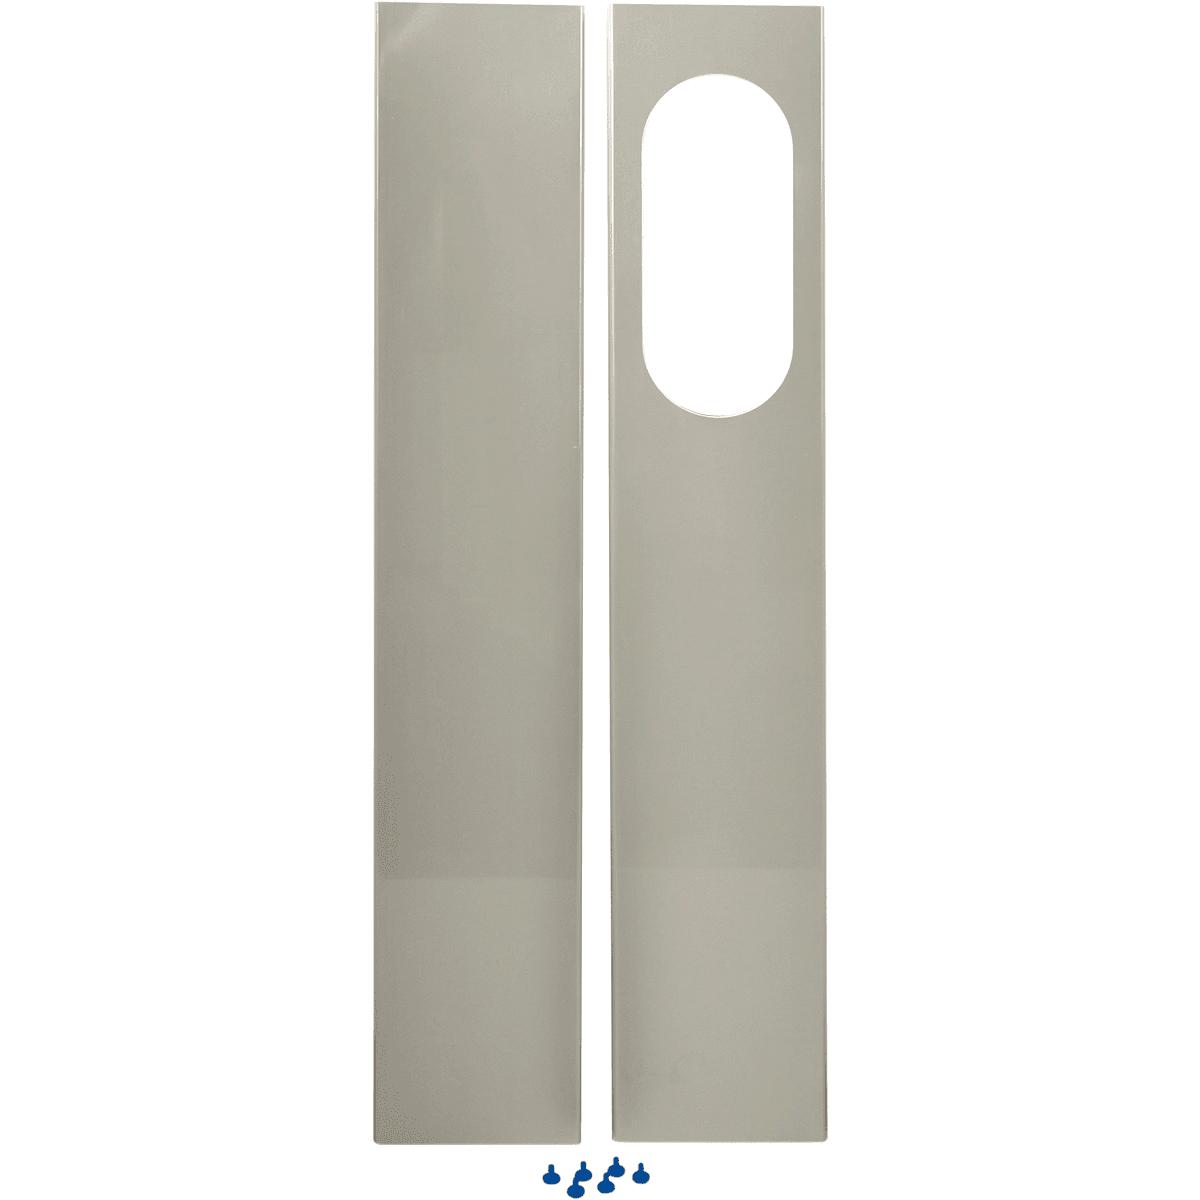 Honeywell HL-Series Portable AC 2-Piece Window Kit 11320118007